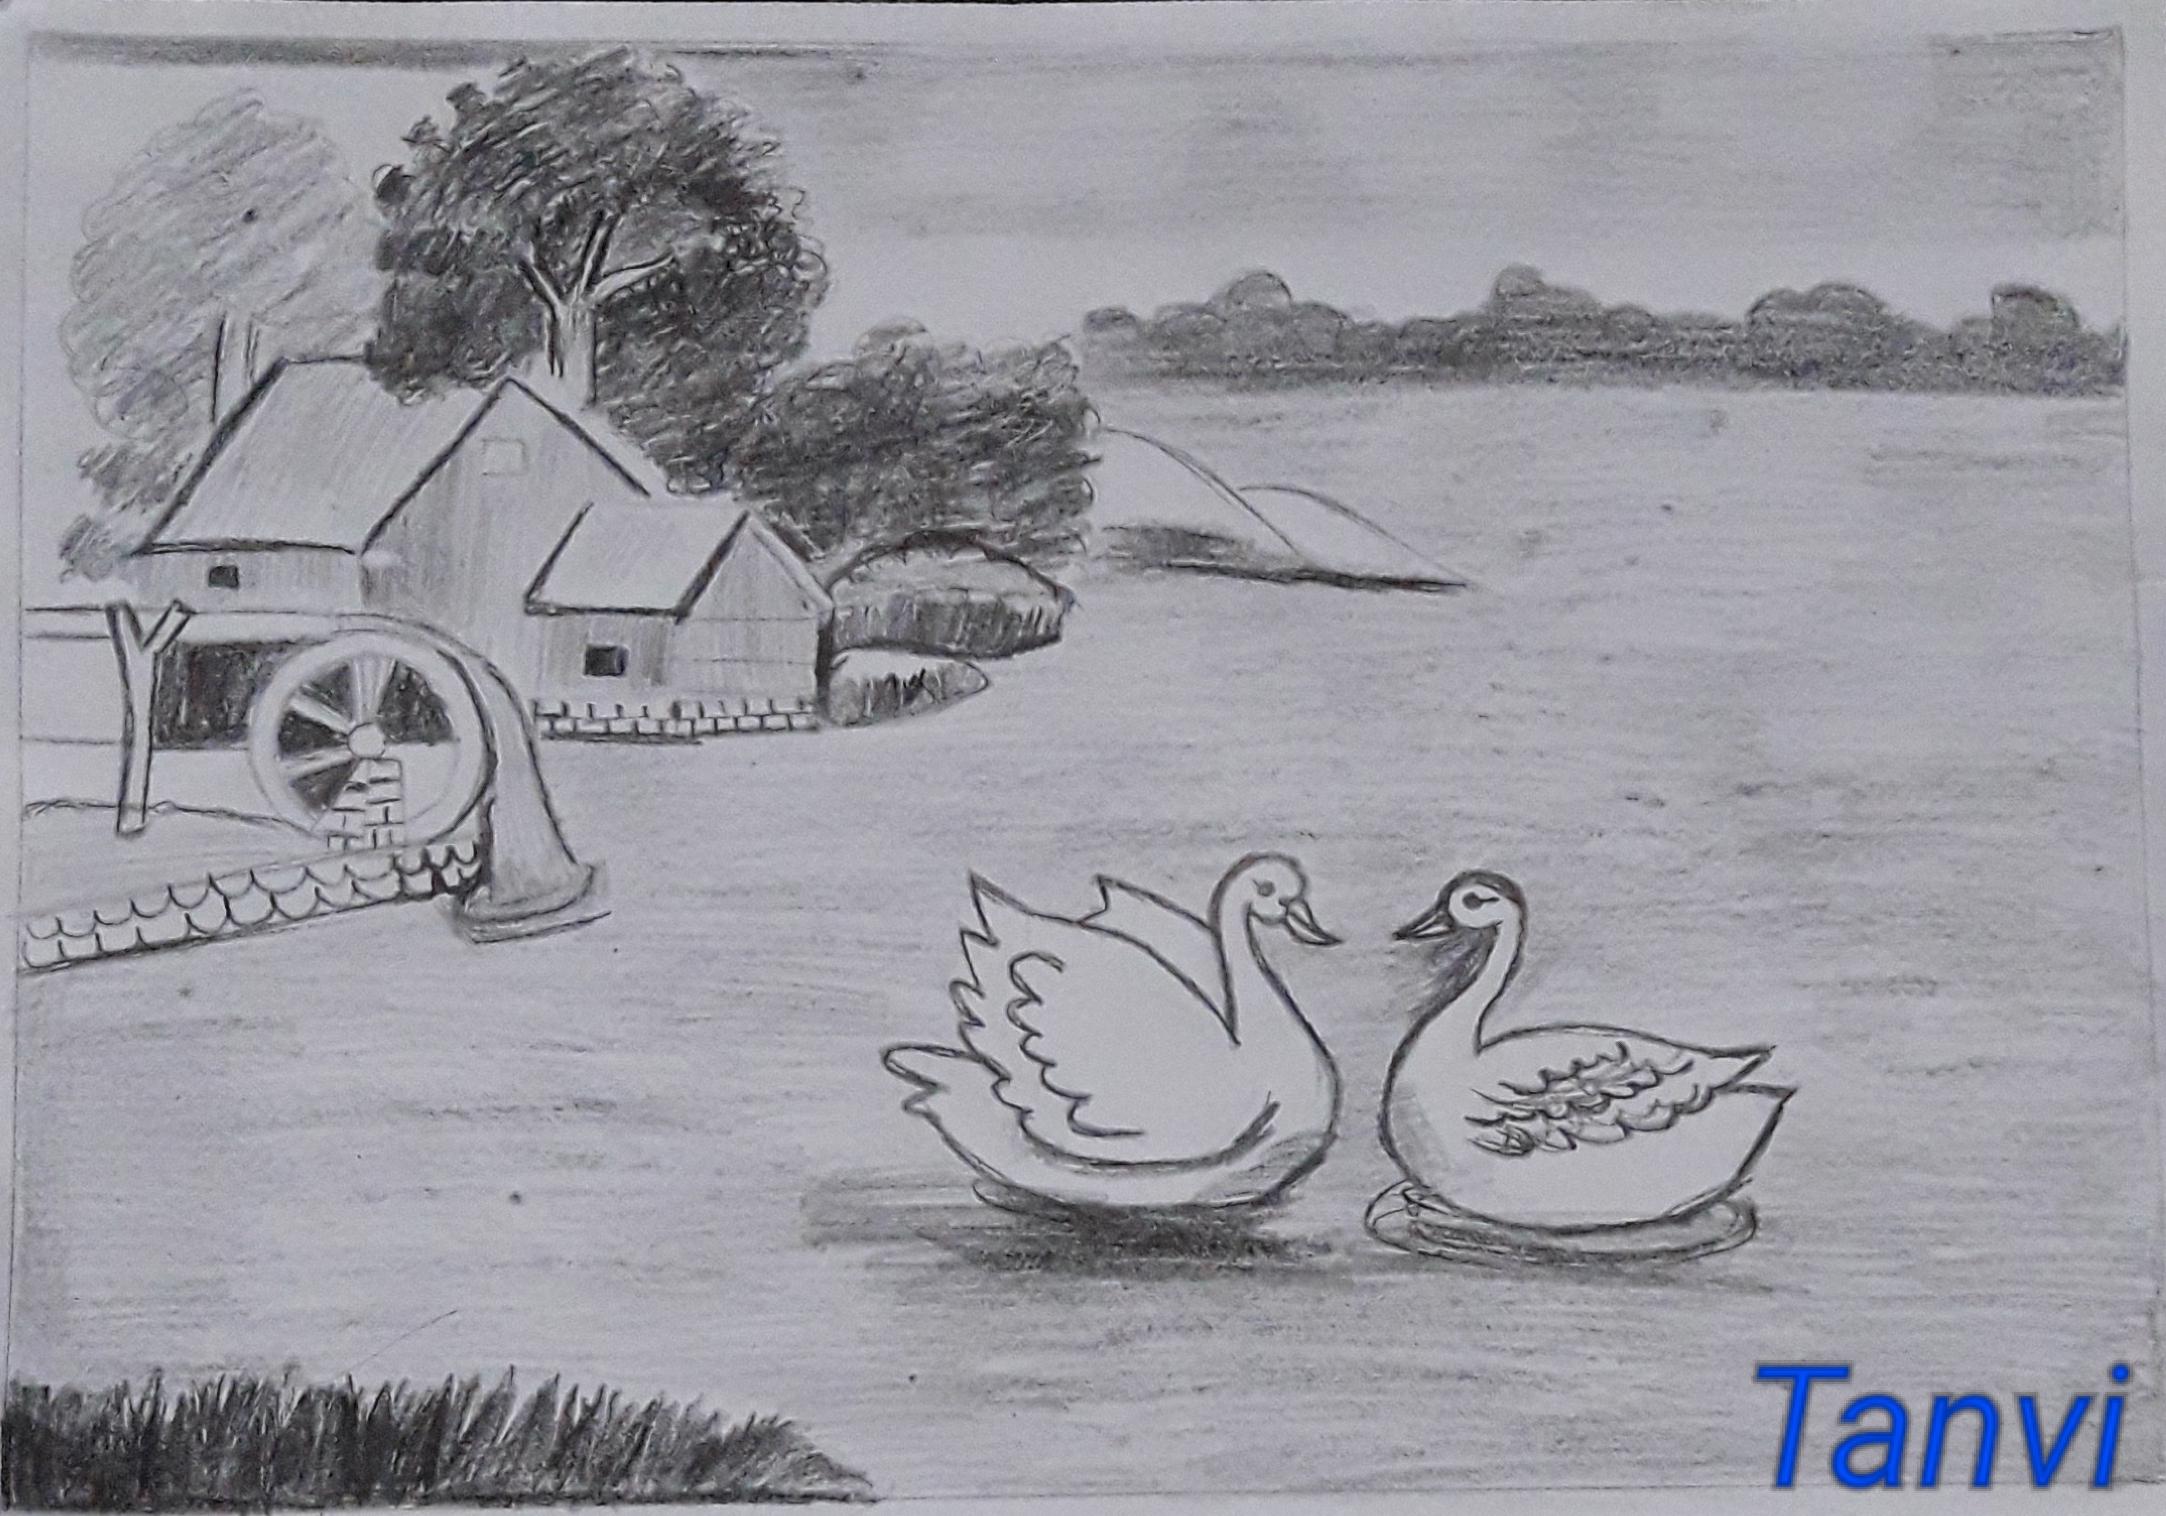 Raga's Sketch 'Nature's Gift'